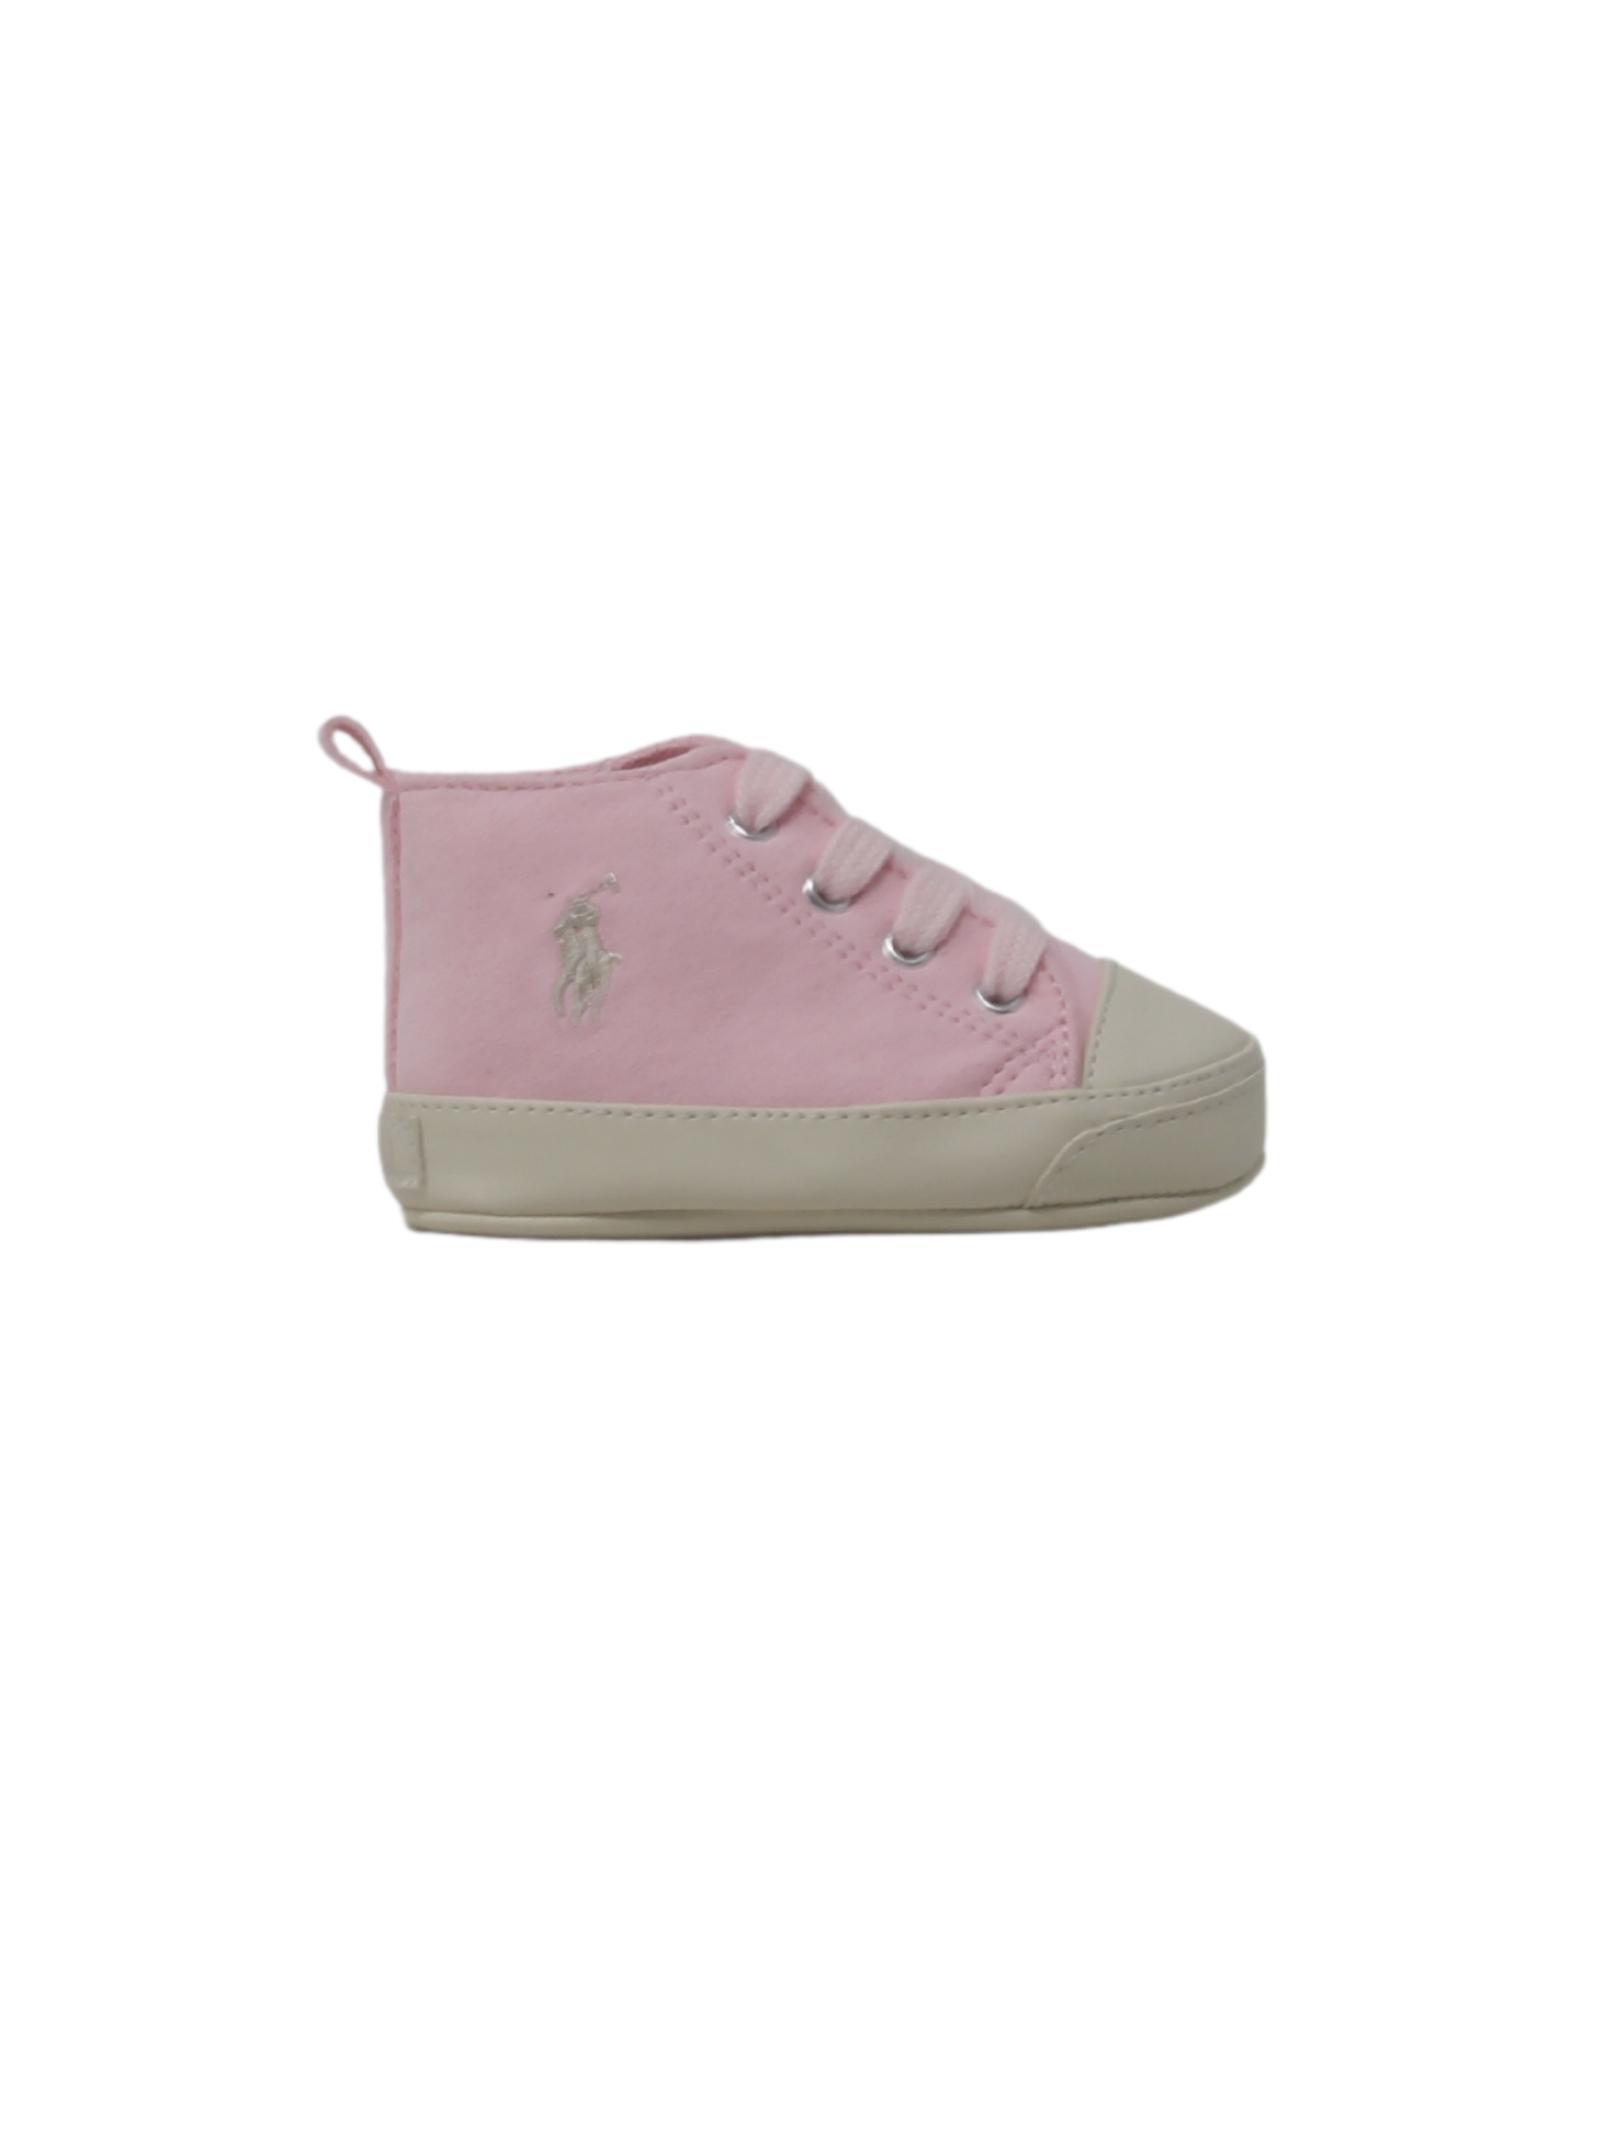 Baby Girl Suede Sneakers POLO RALPH LAUREN JUNIOR | Sneakers | 13RL100614ROSA